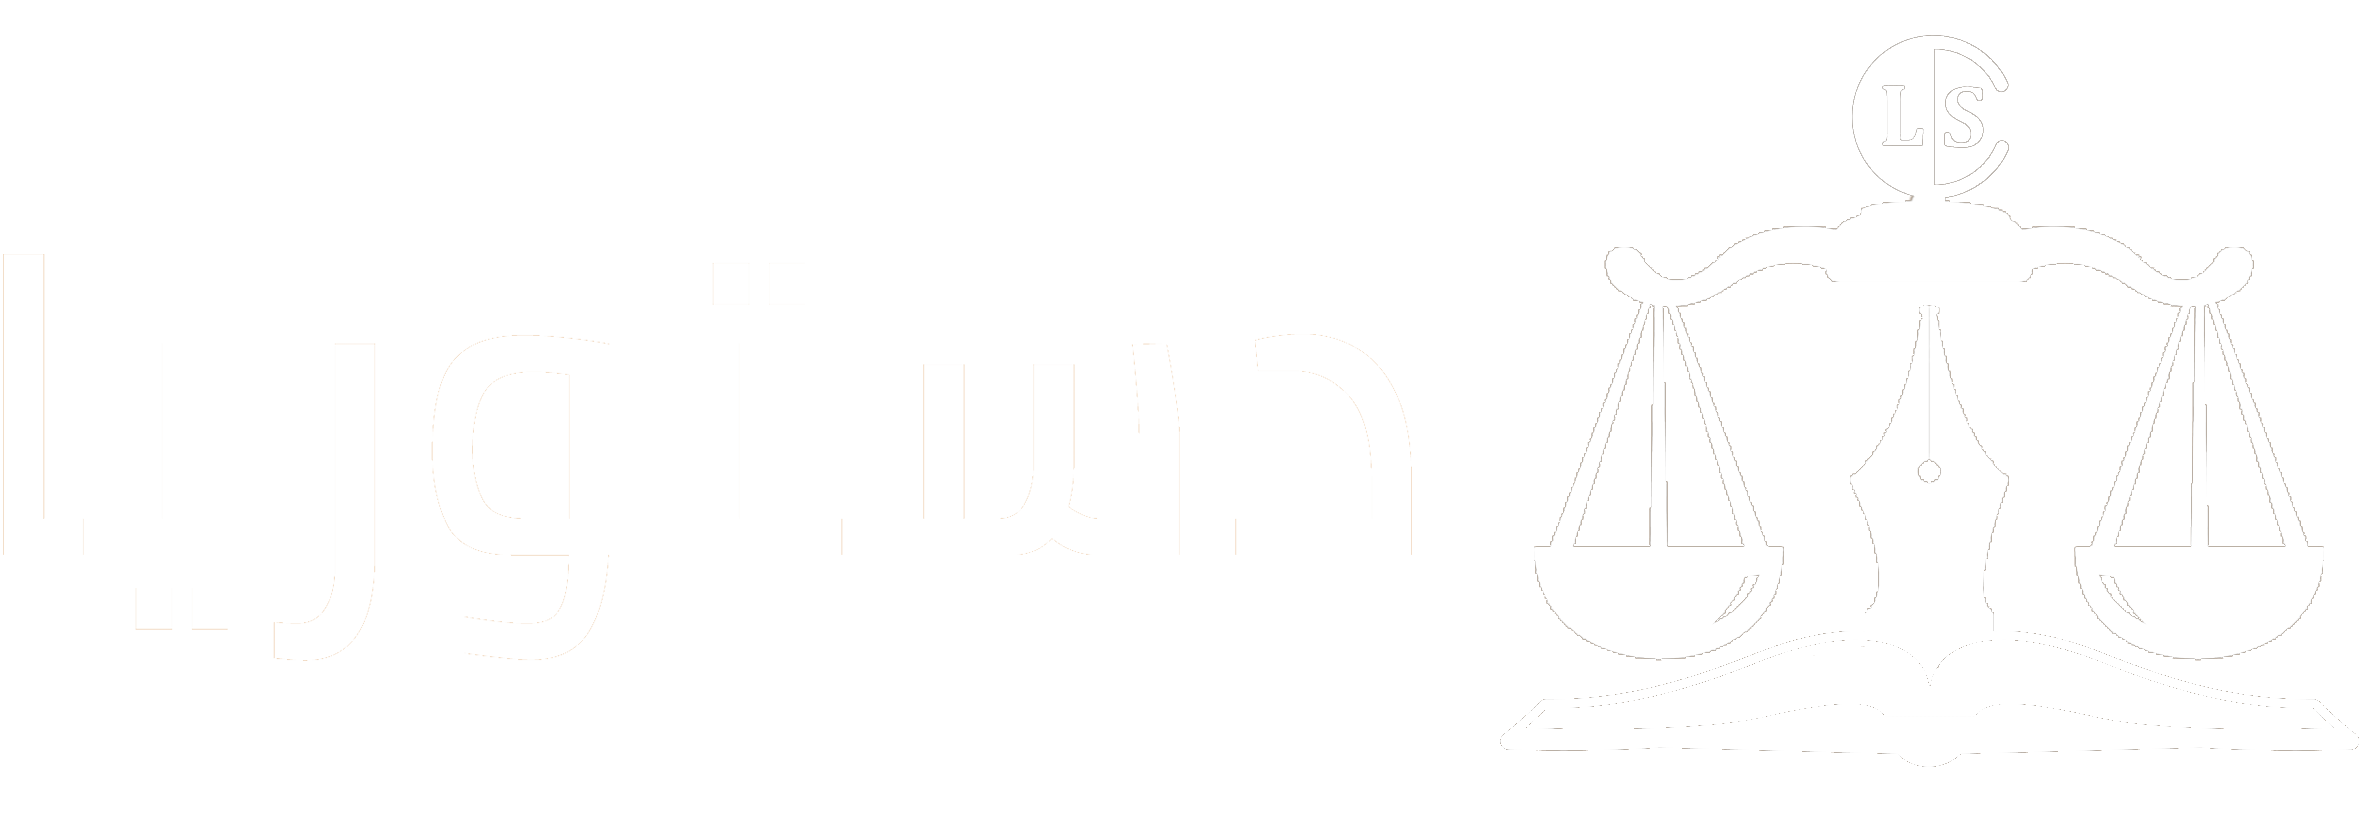 دستوريا